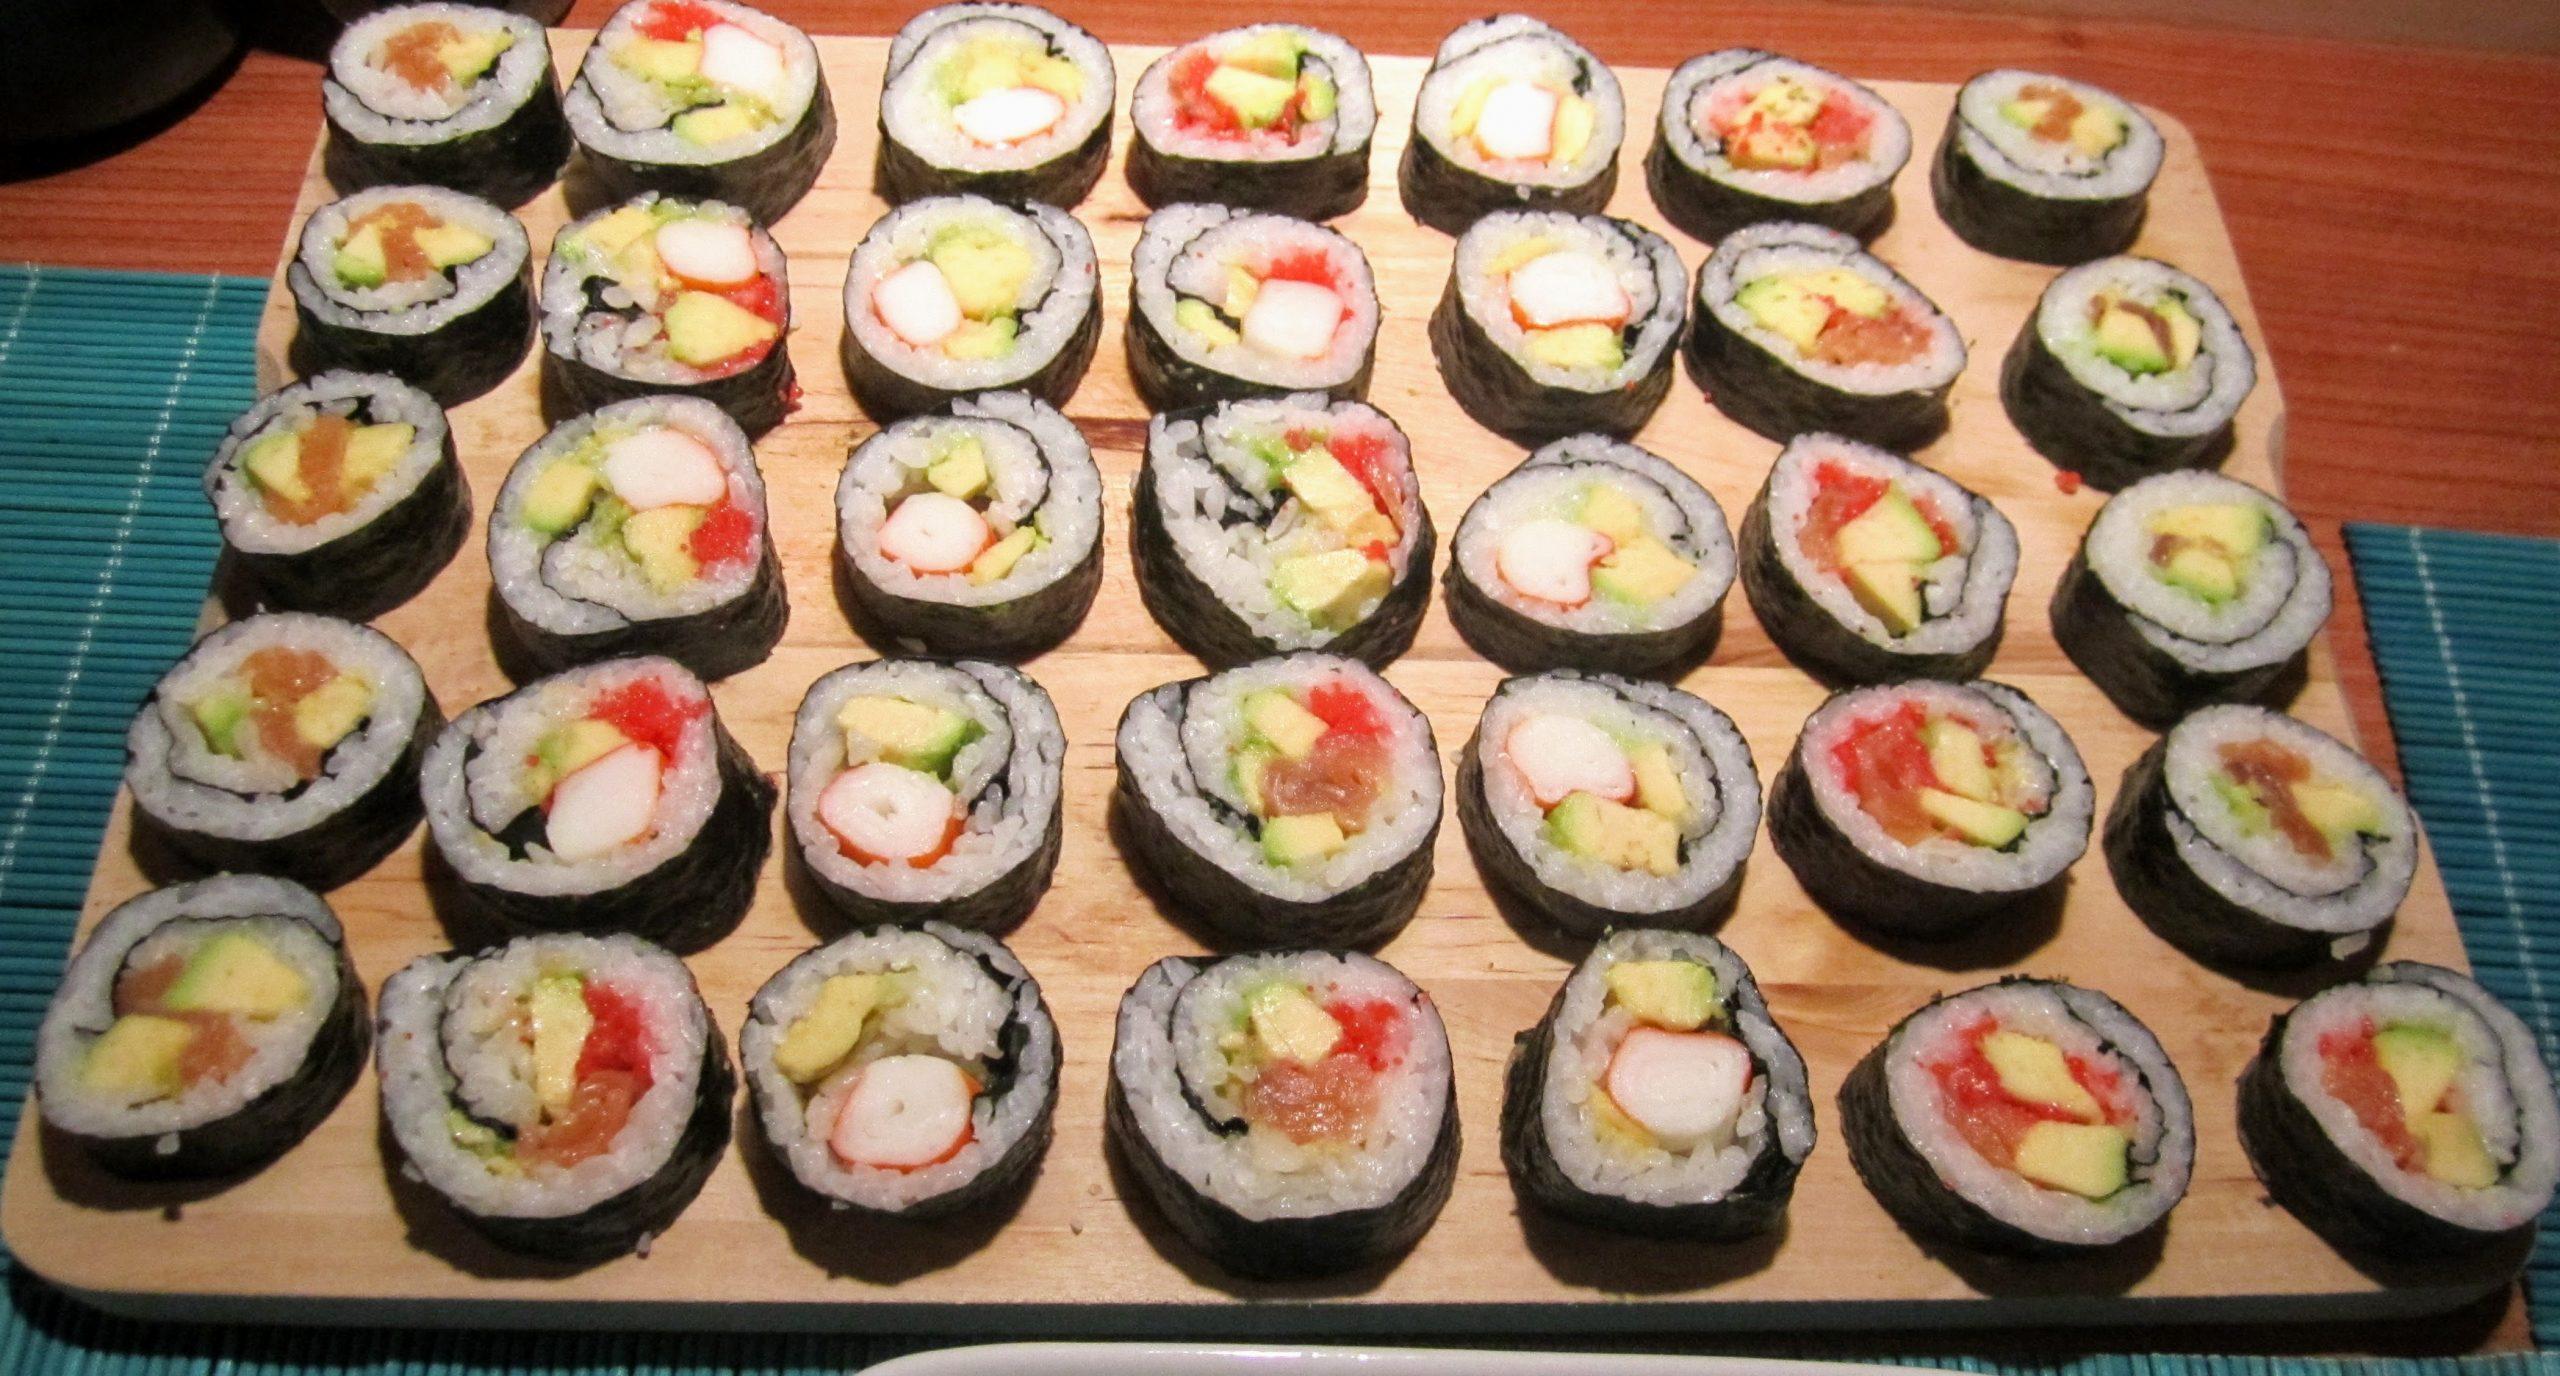 Primo sushi: maki salmone/avocado, maki surimi/ravanelli